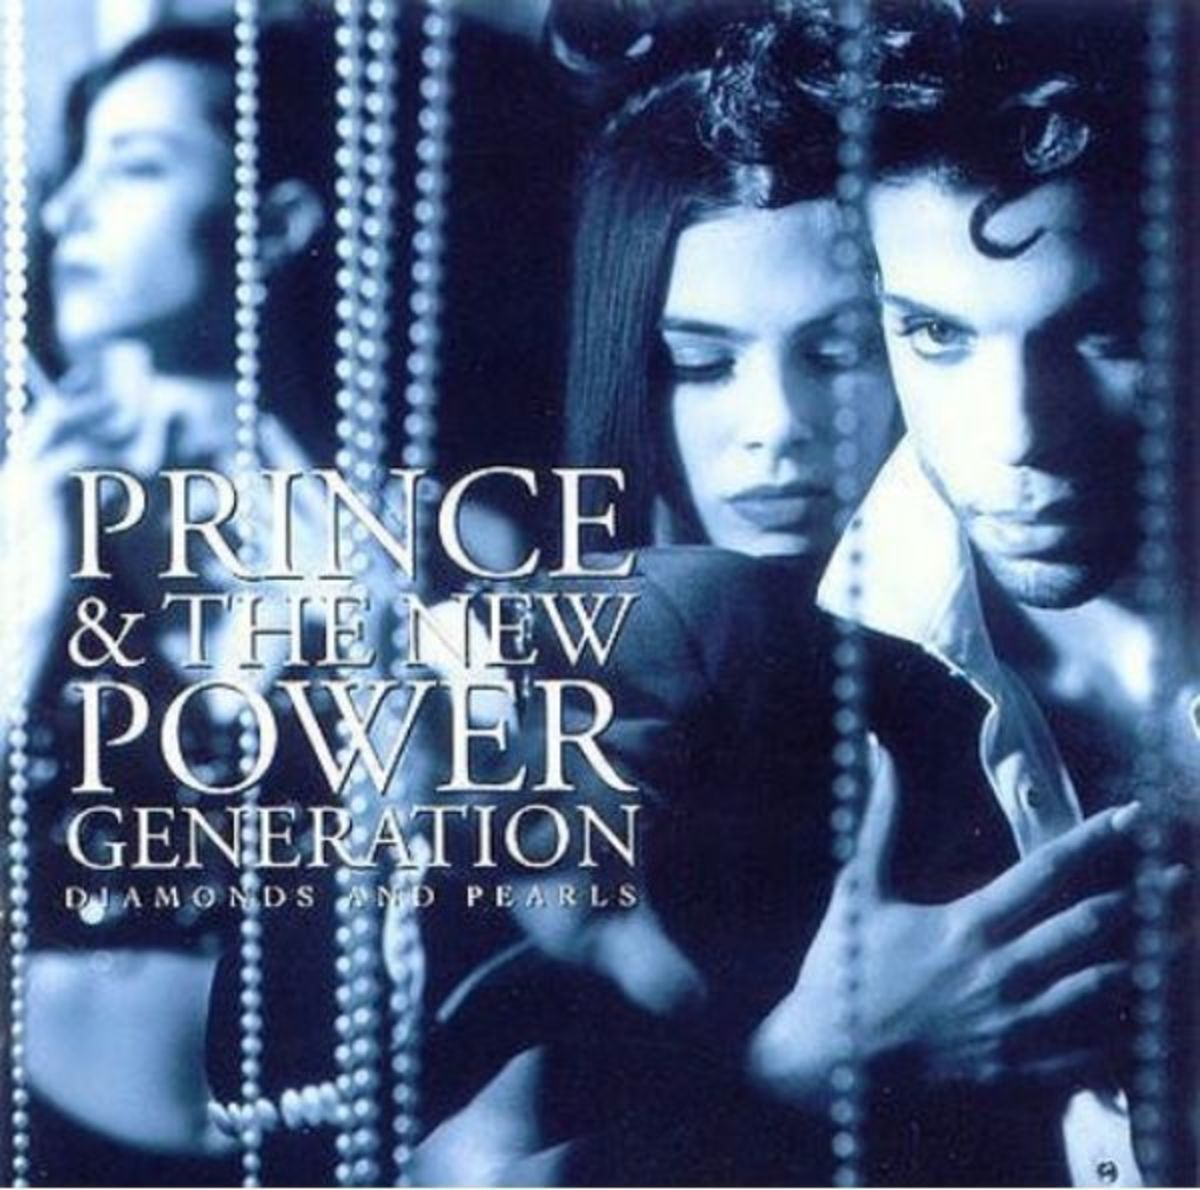 Prince's Diamonds & Pearls